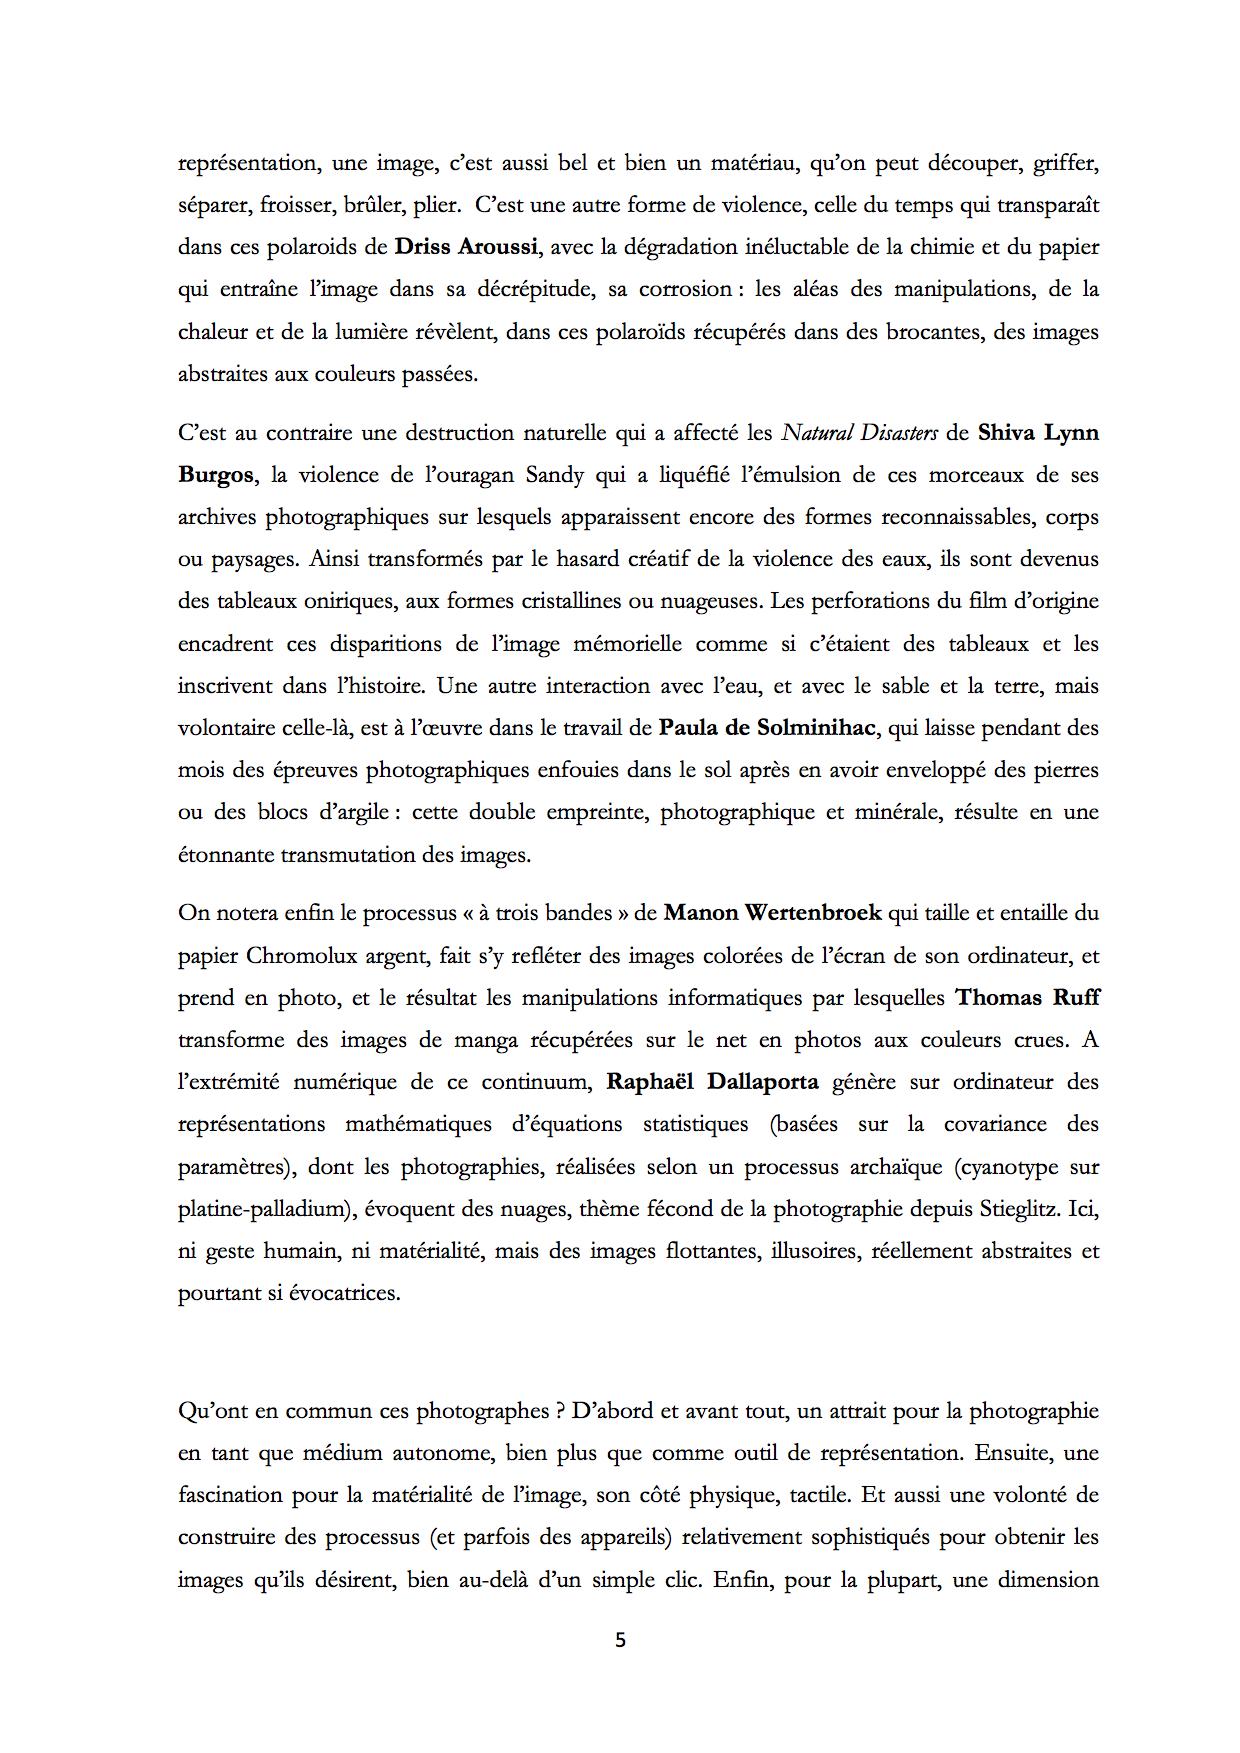 MARC LENOT text5.jpg